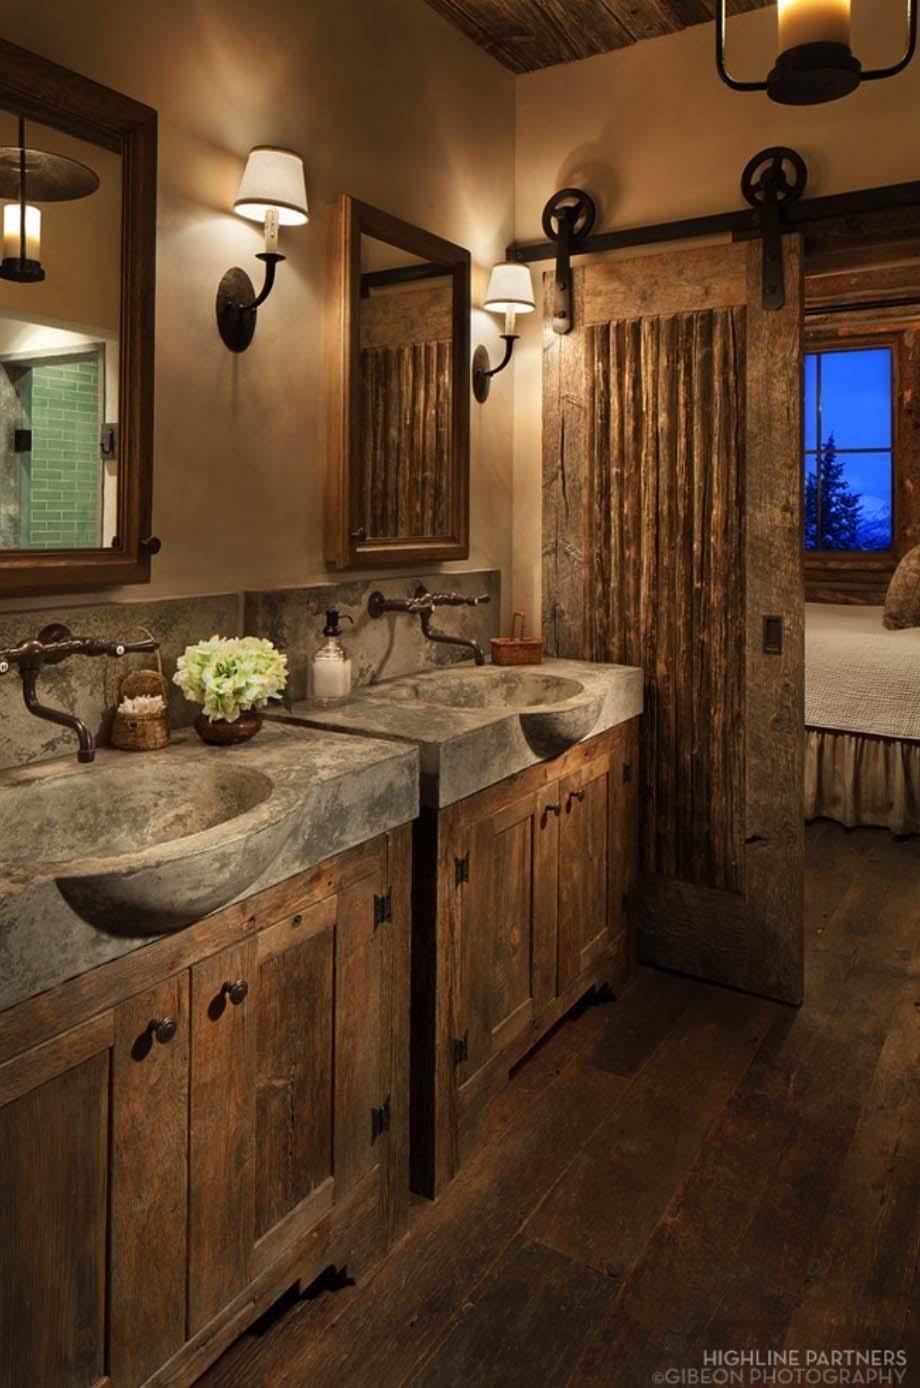 Amazing Decor Ideas Decor Concrete Sinks Barn Door Rustic Bathroom Design Rustic Bathroom Dcor 2018 Rustic Home Accessories Rustic Home Accessories home decor Rustic Home Accessory